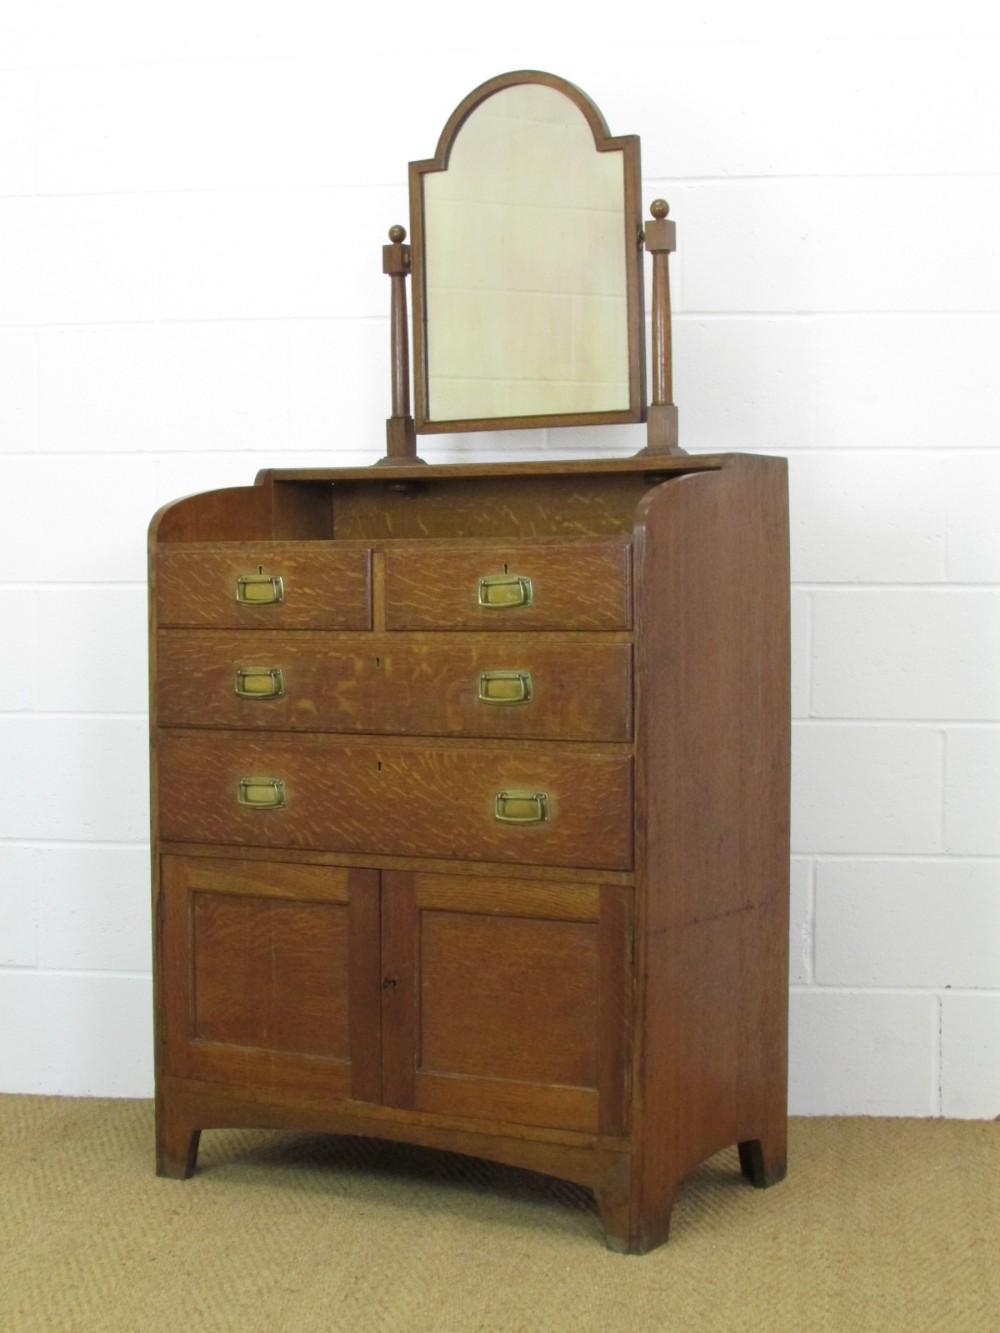 heal's arts crafts oak dressing chest